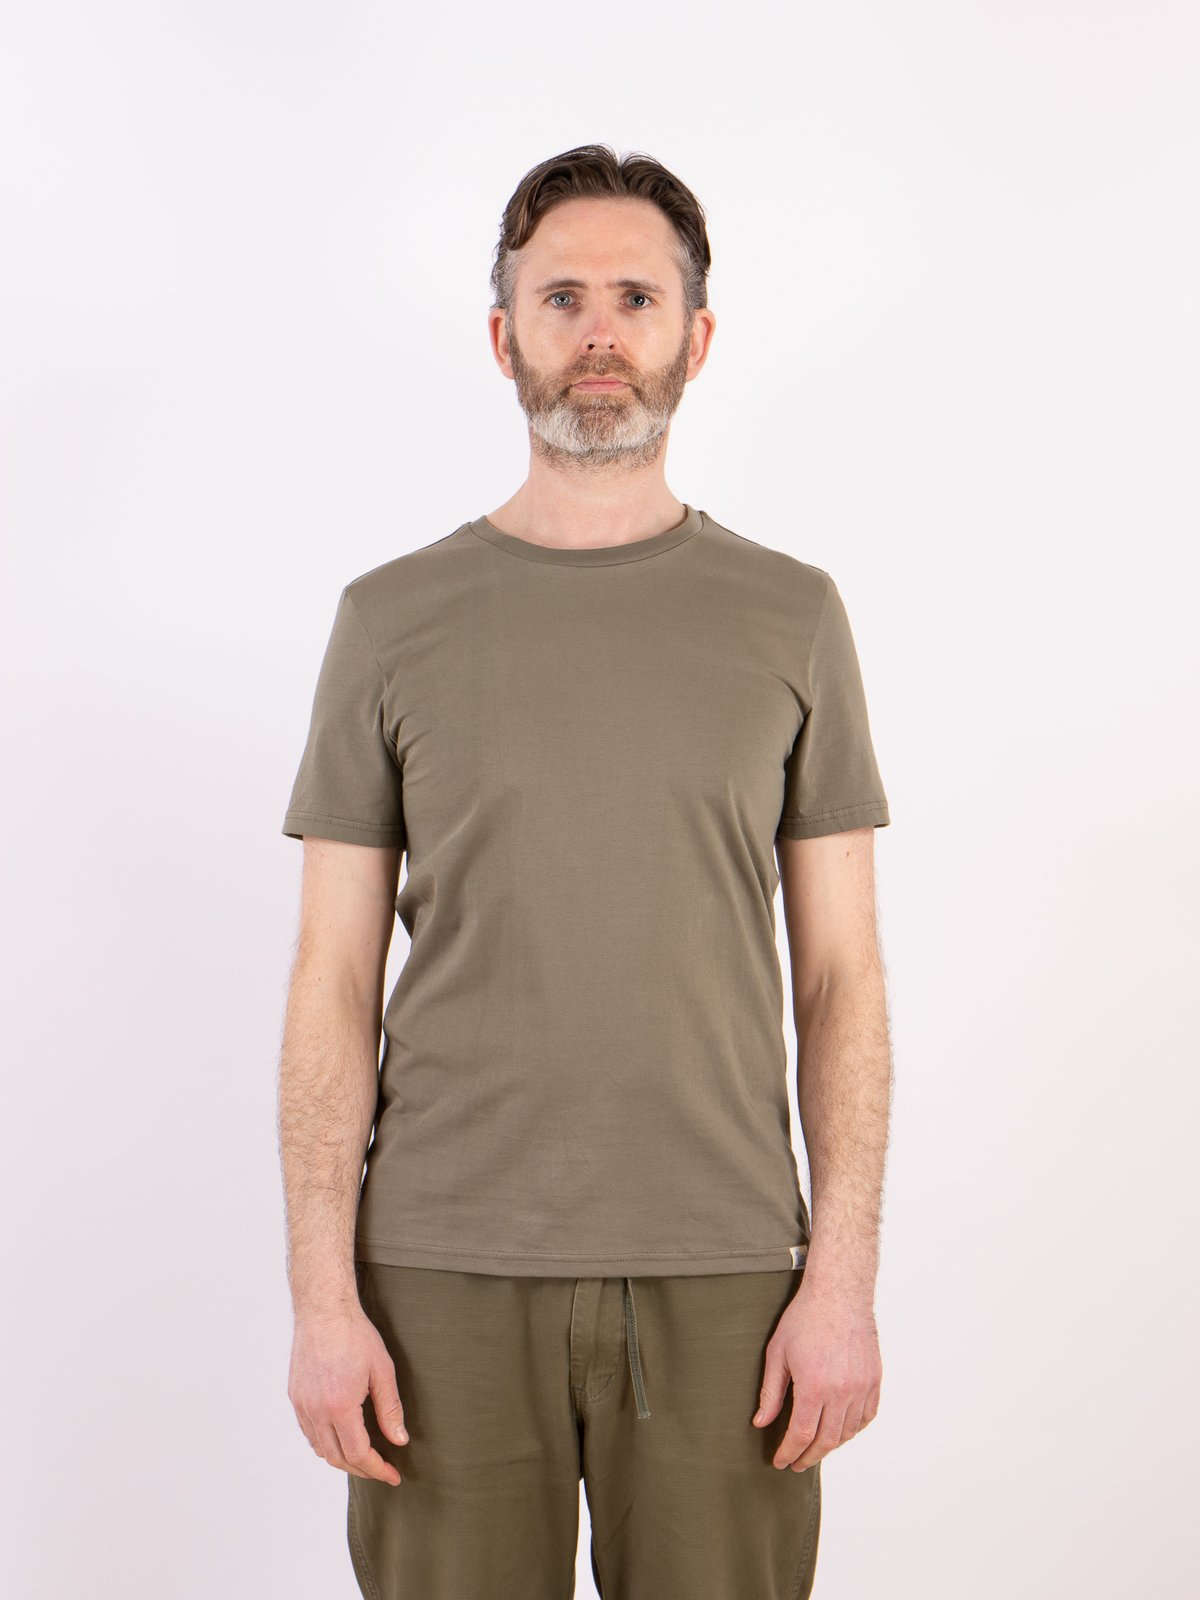 Army Good Basics CT01 Crew Neck Tee - Image 2